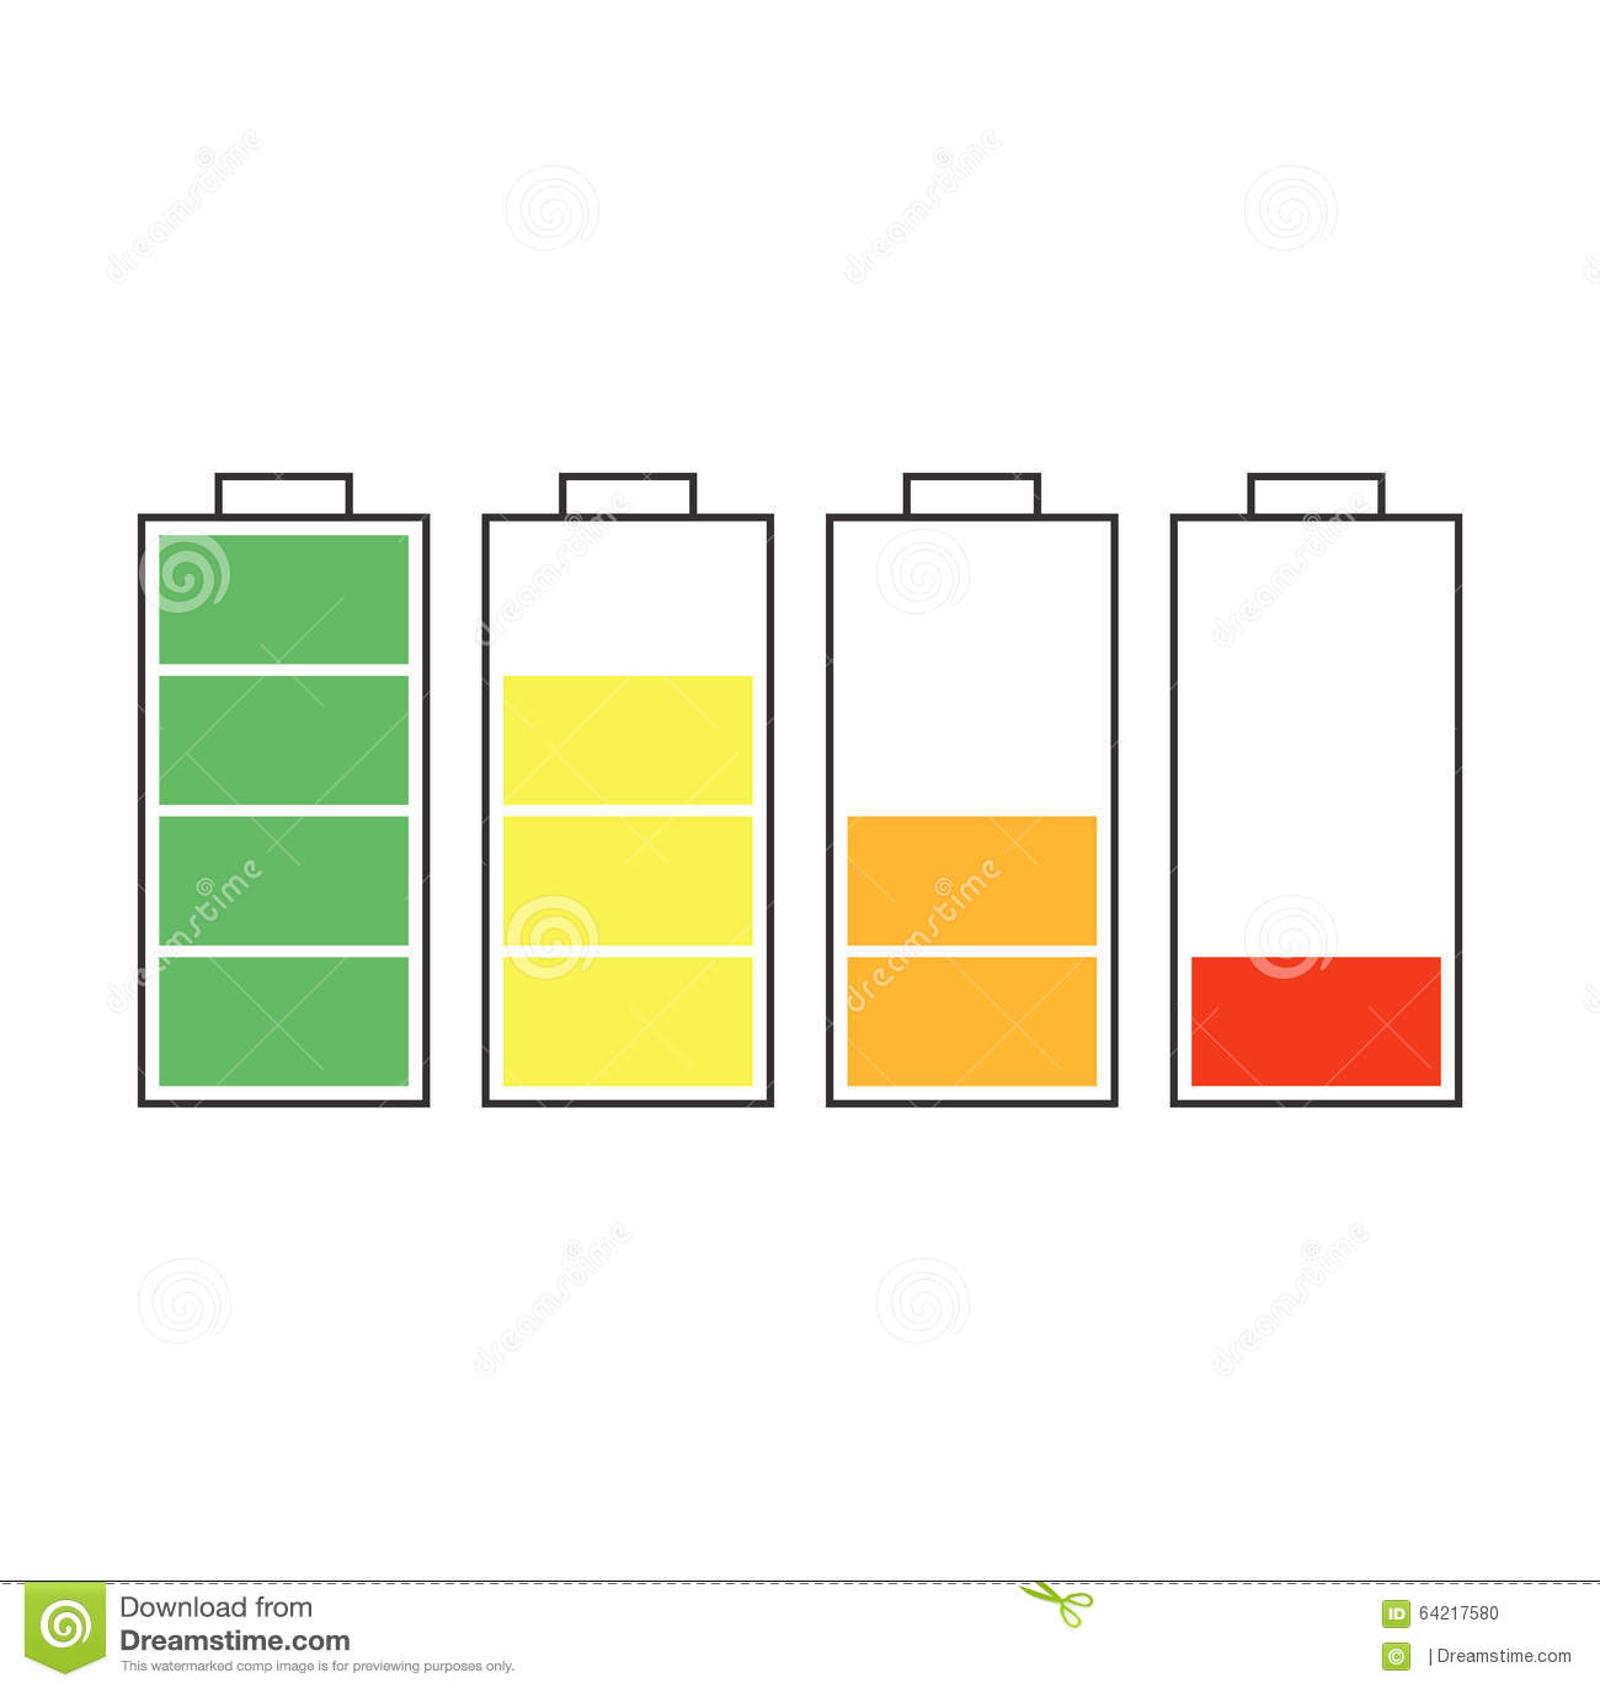 Windows 8 1 Set Battery Charge Level : Battery charger stock illustration image